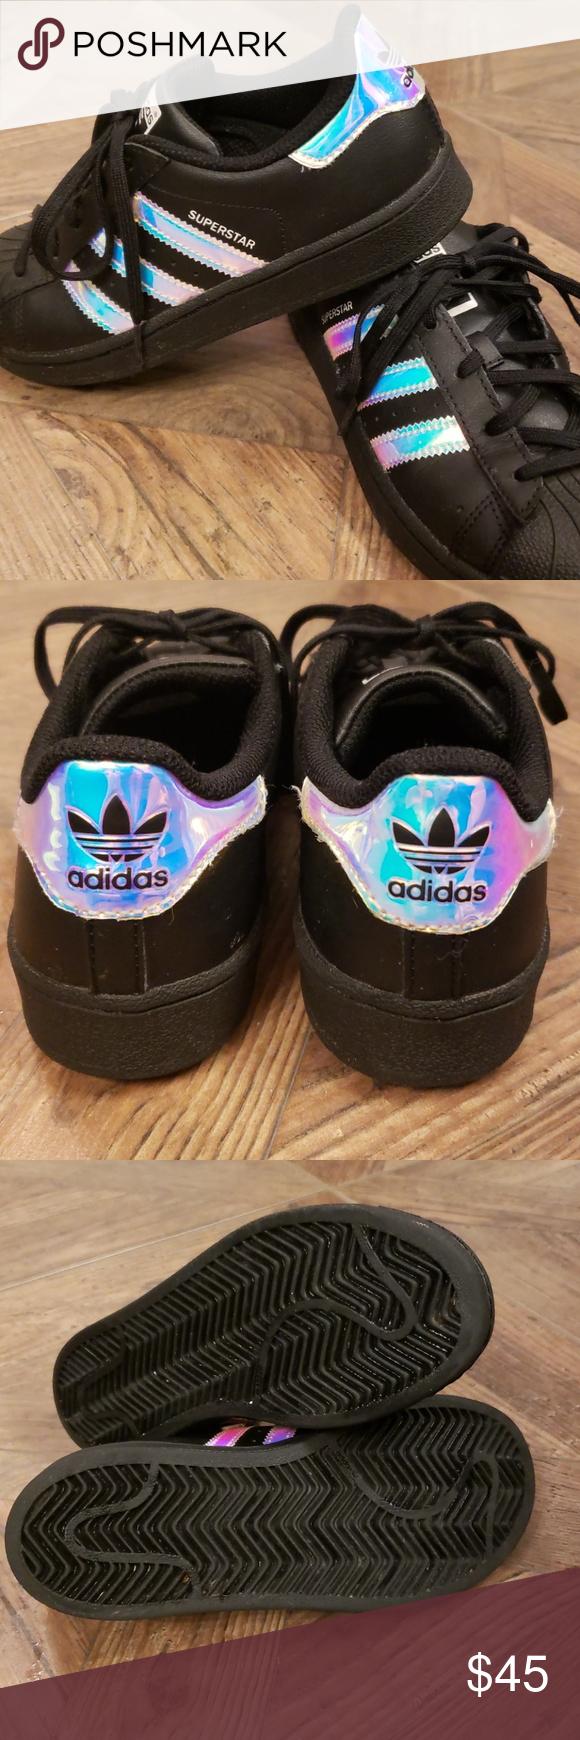 Adidas superstar sneakers   Adidas